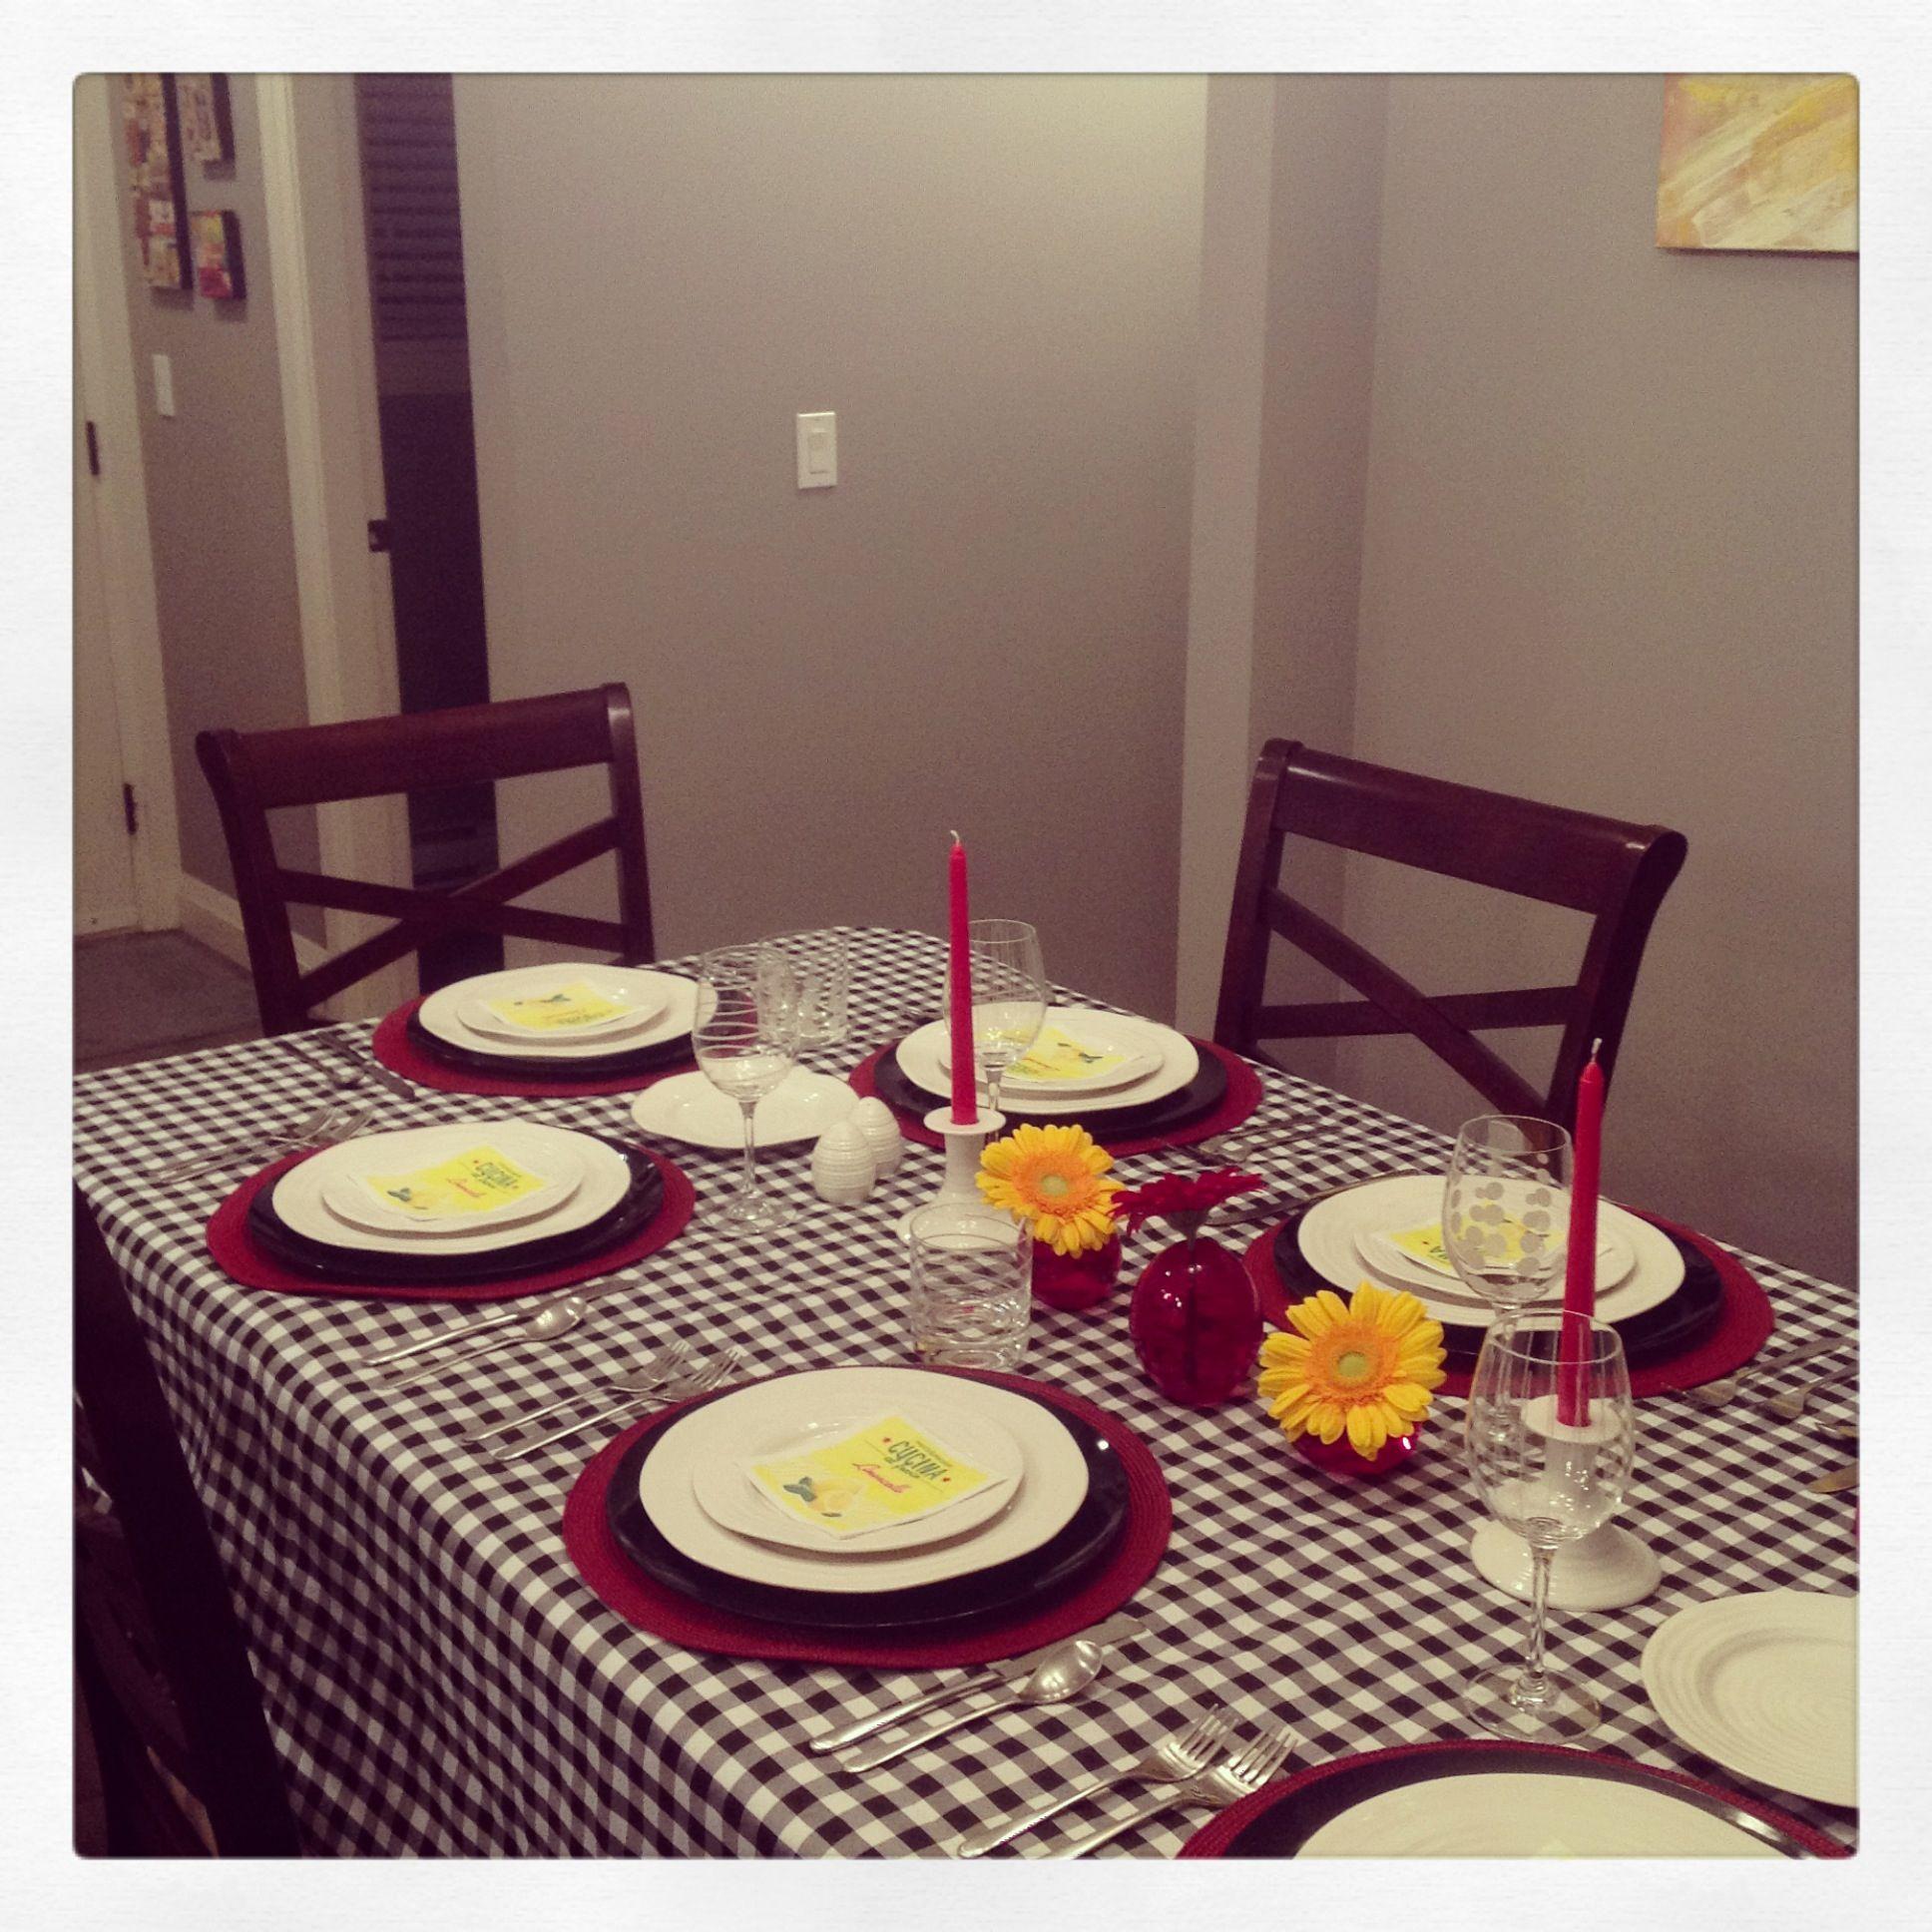 Italian themed dinner party table setting | Une Petite Fête ...